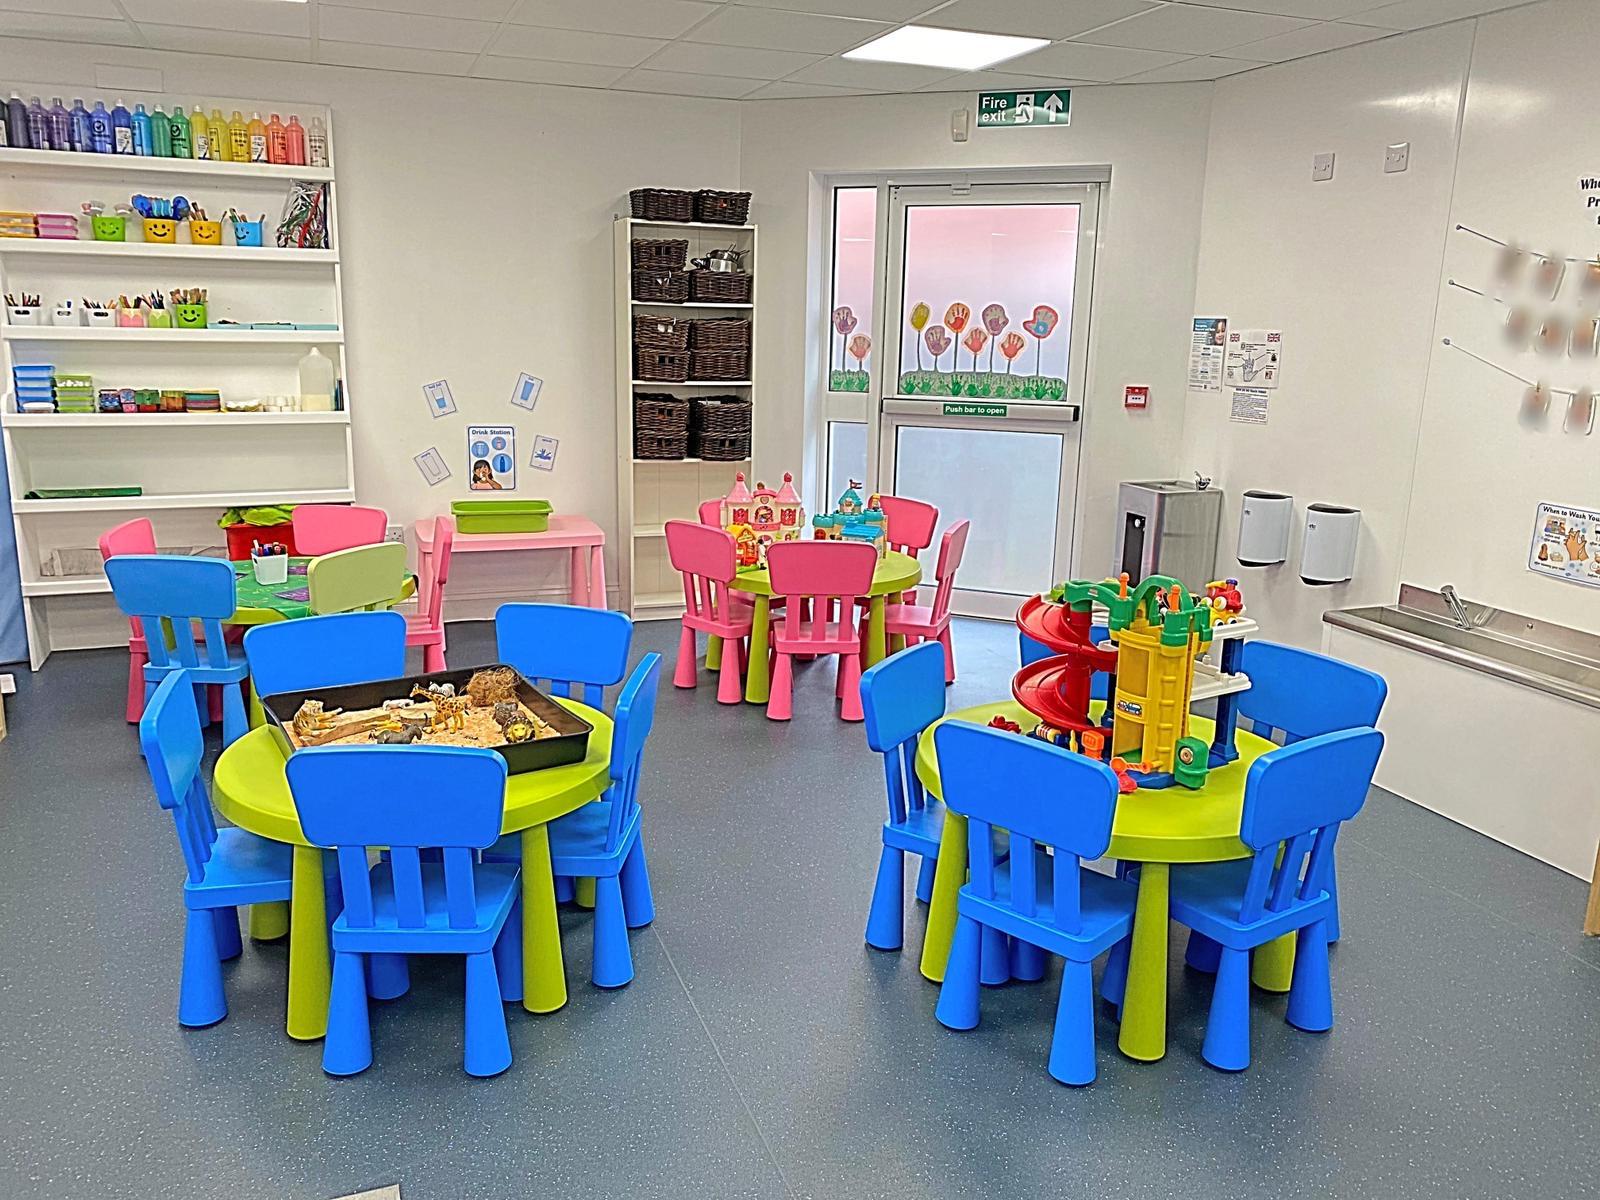 Apsley day nursery